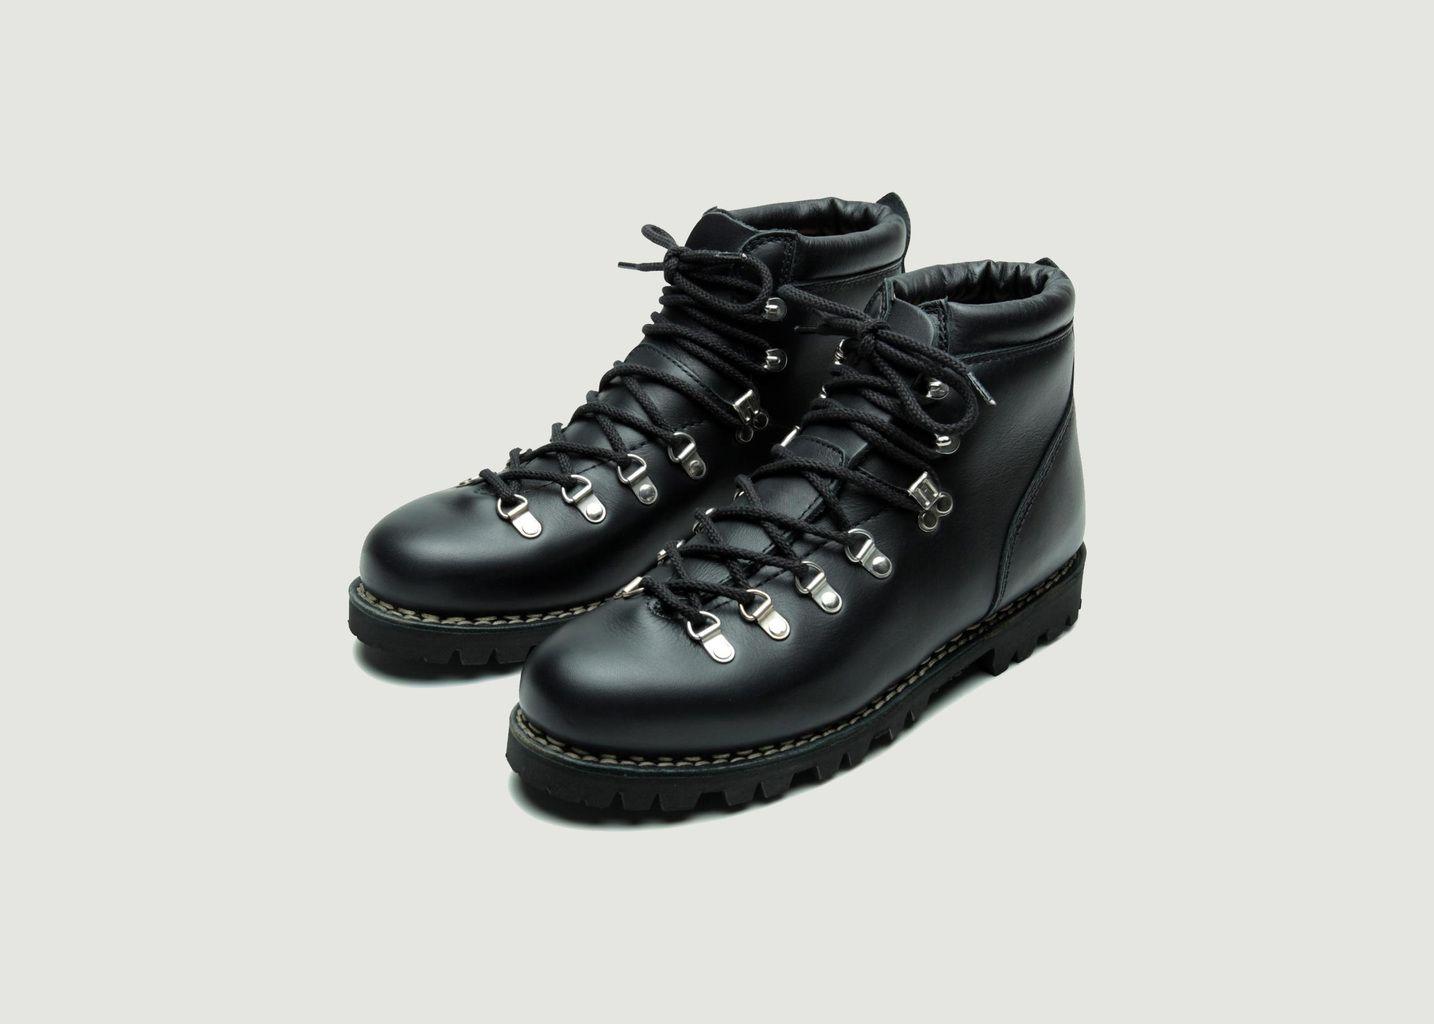 boots Avoriaz - Paraboot